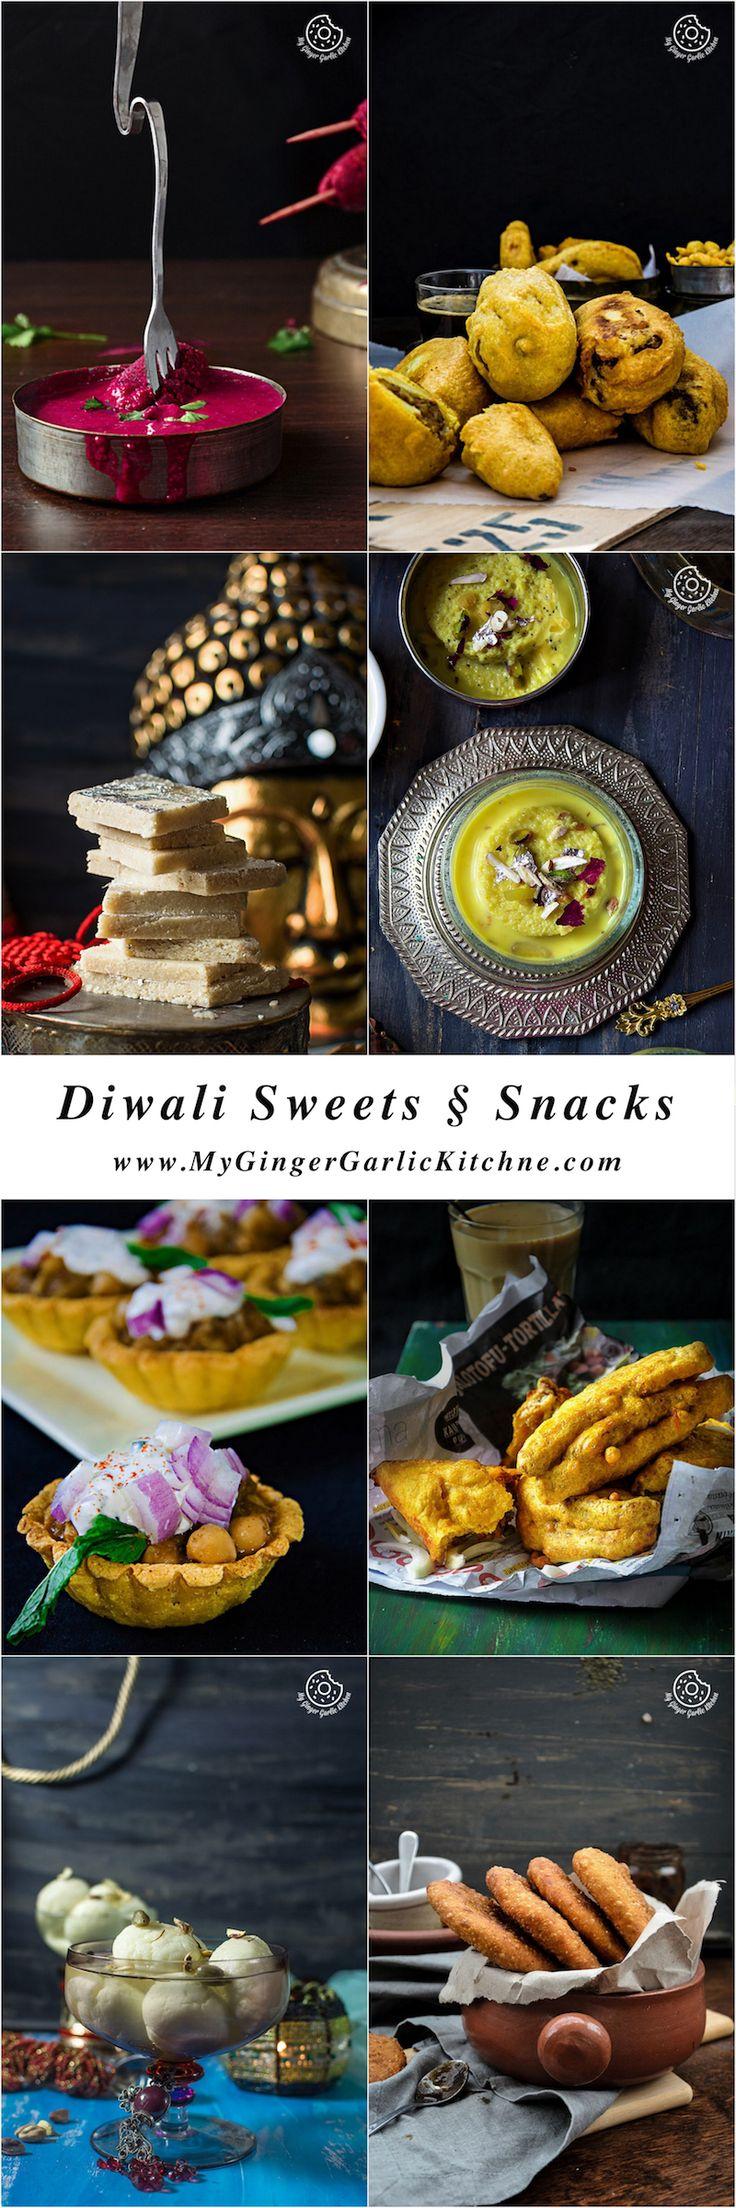 Diwali Sweets and Snacks Recipes | mygingergarlickitchen.com/ @anupama_dreams